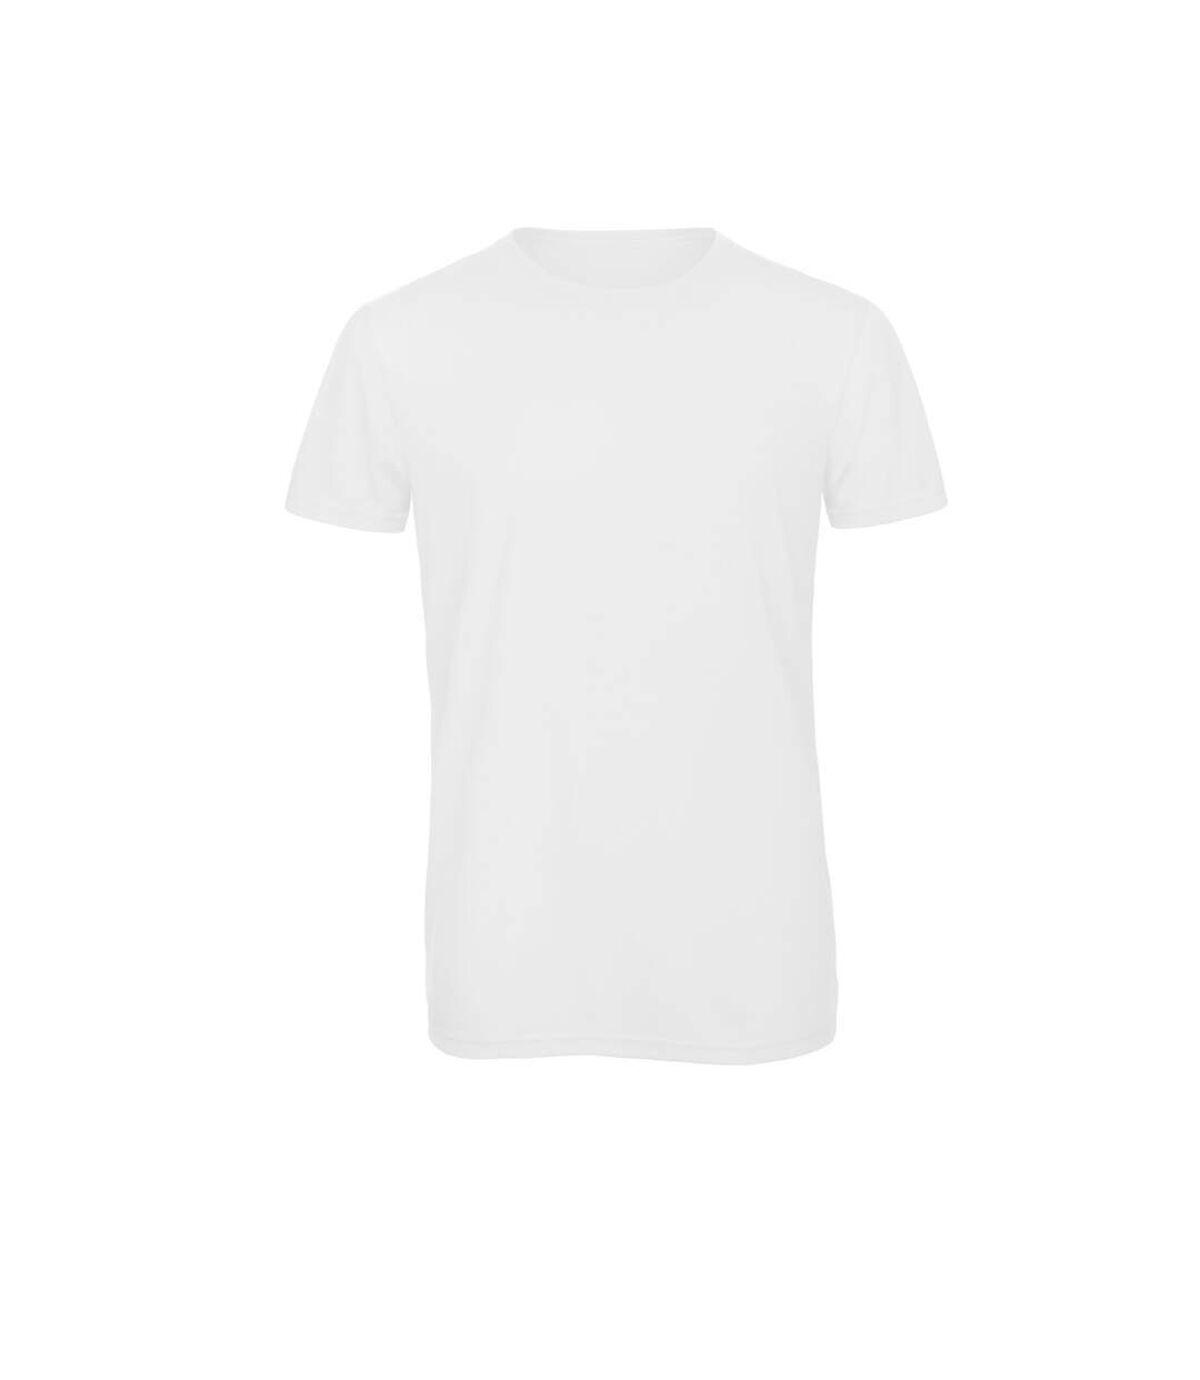 B&C Mens Favourite Short Sleeve Triblend T-Shirt (White) - UTBC3638